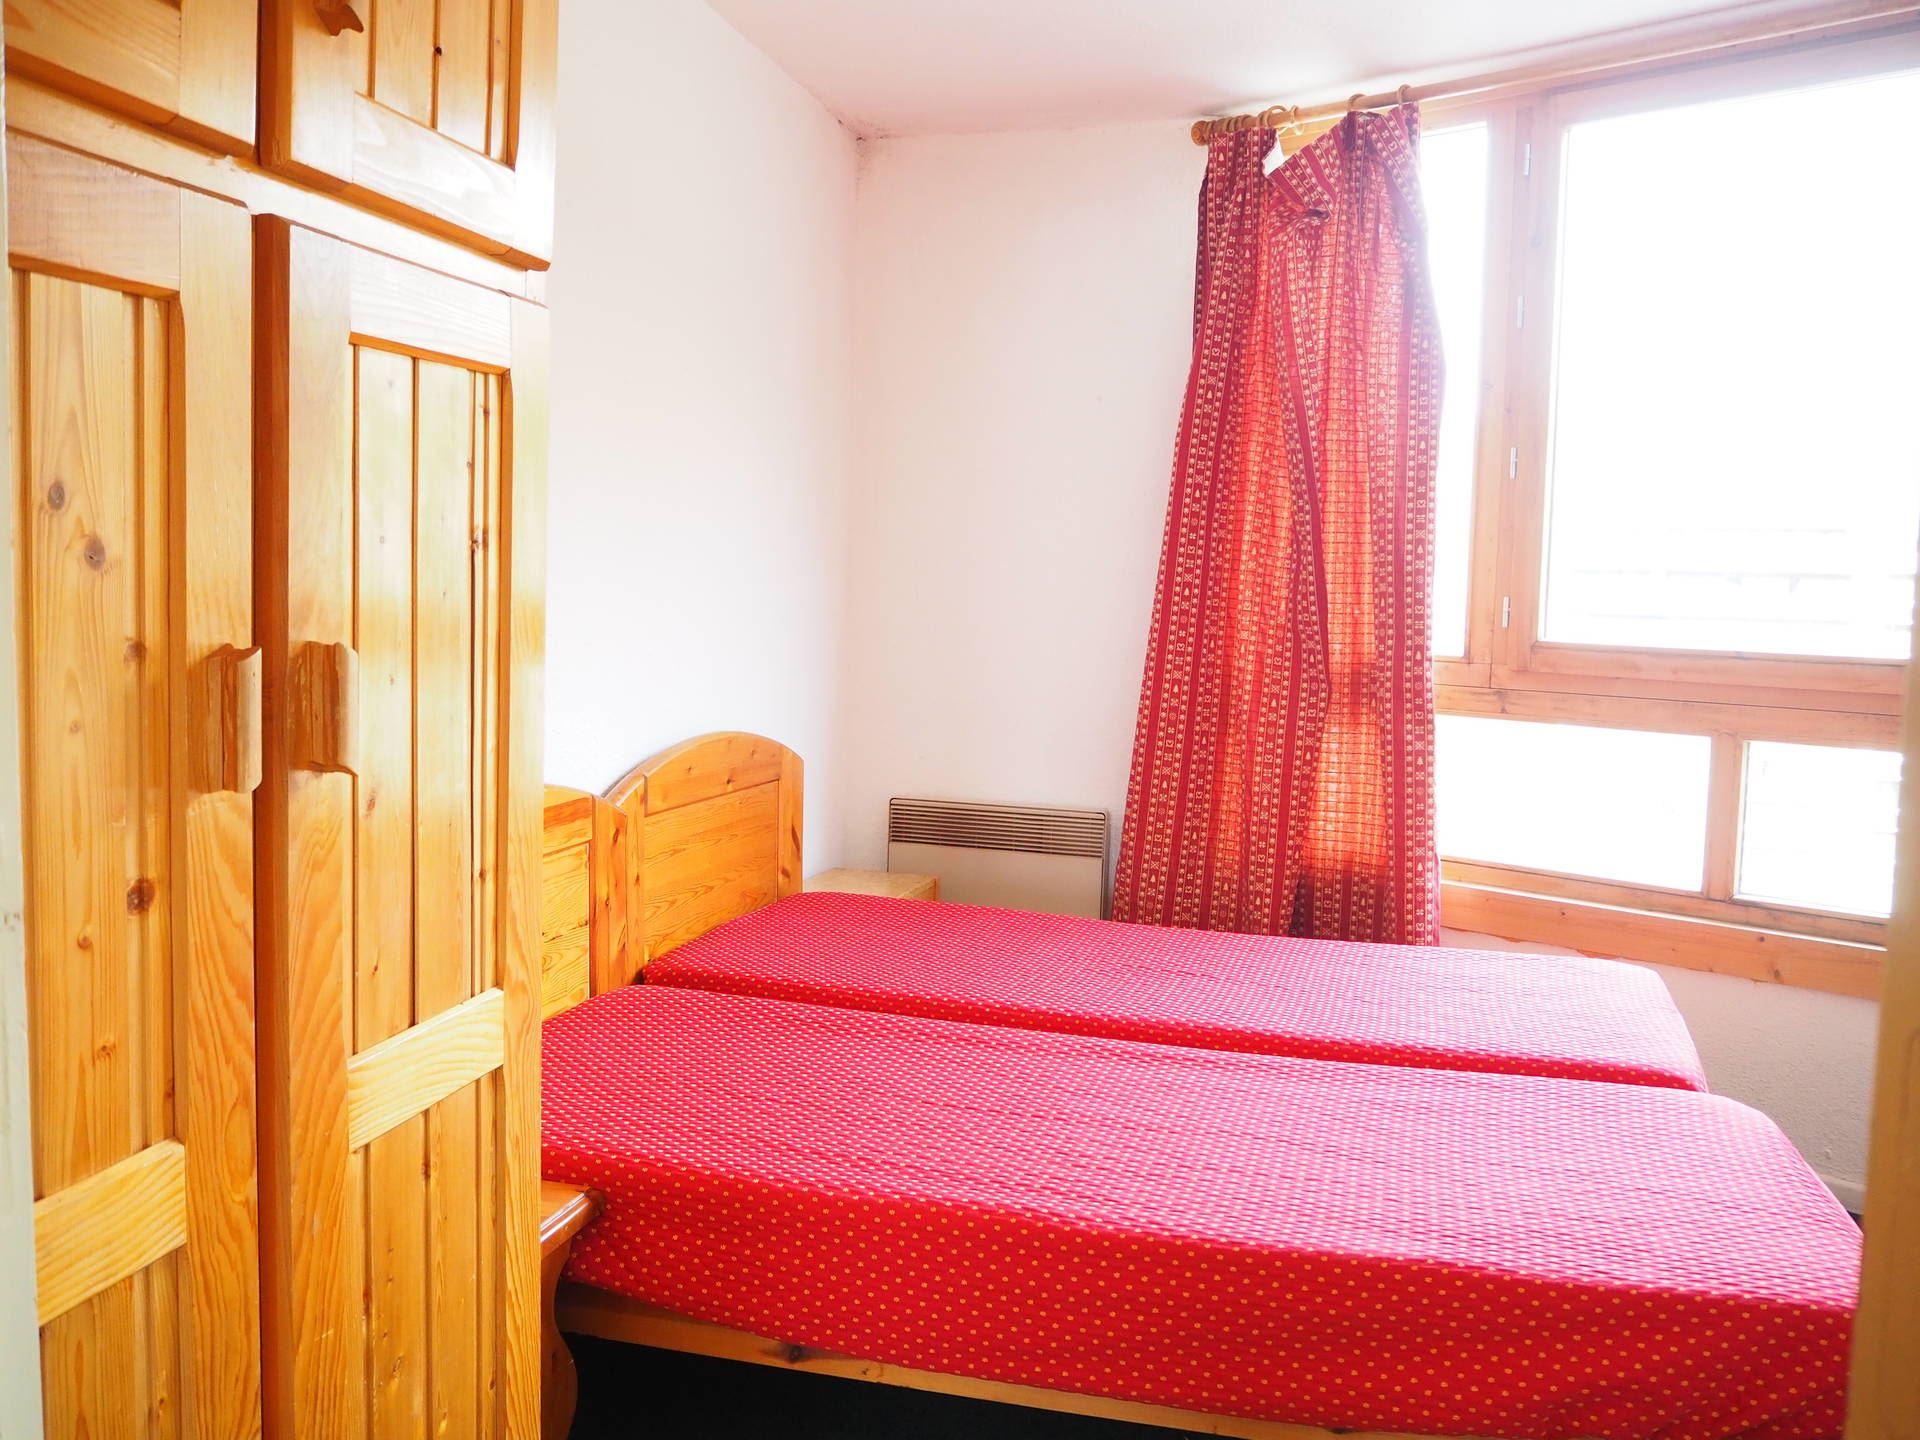 4 Rooms 10 Pers ski-in ski-out / GRANDE MASSE 806